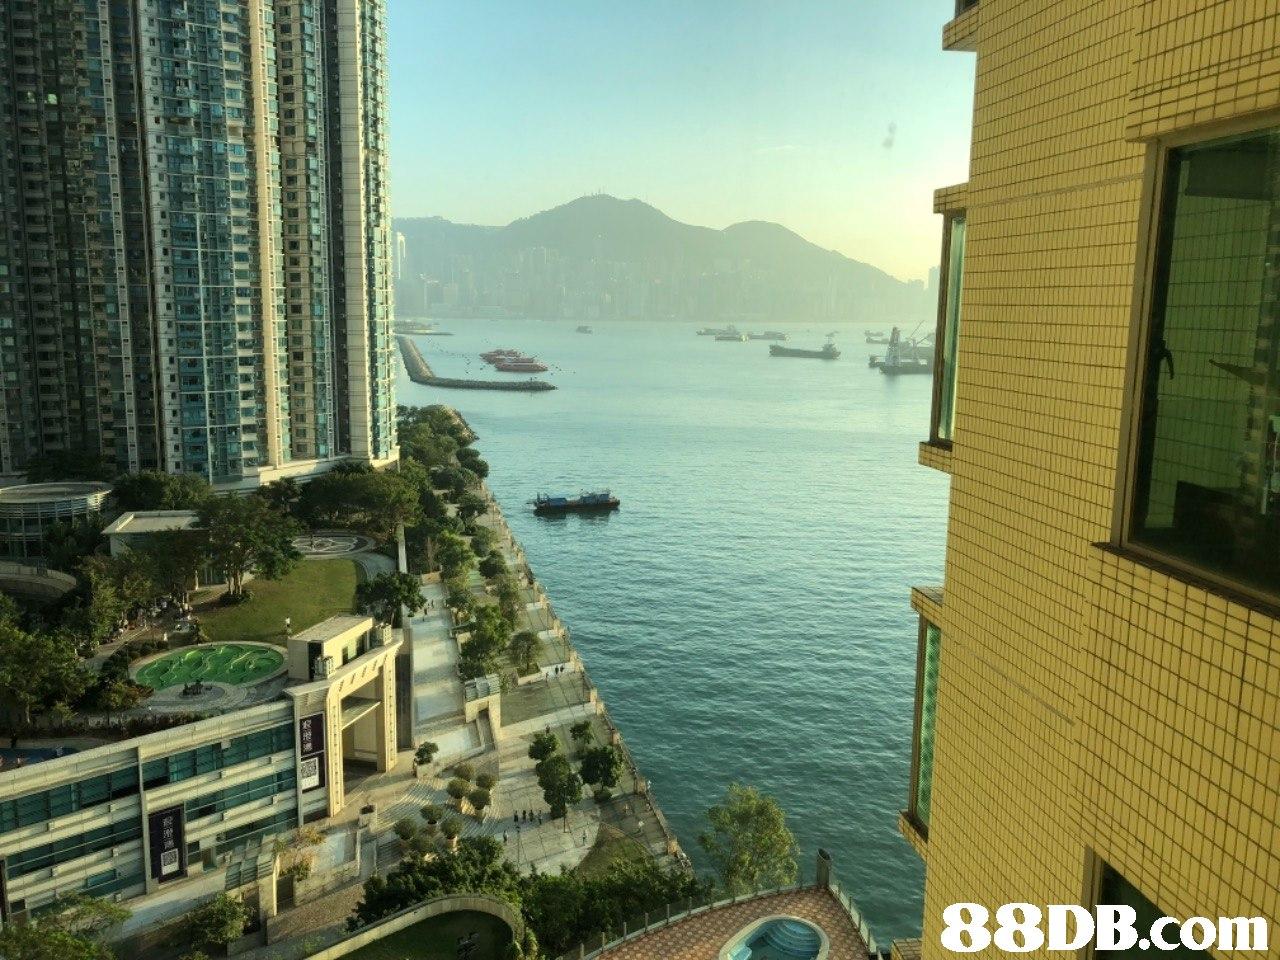 property,sky,city,condominium,real estate